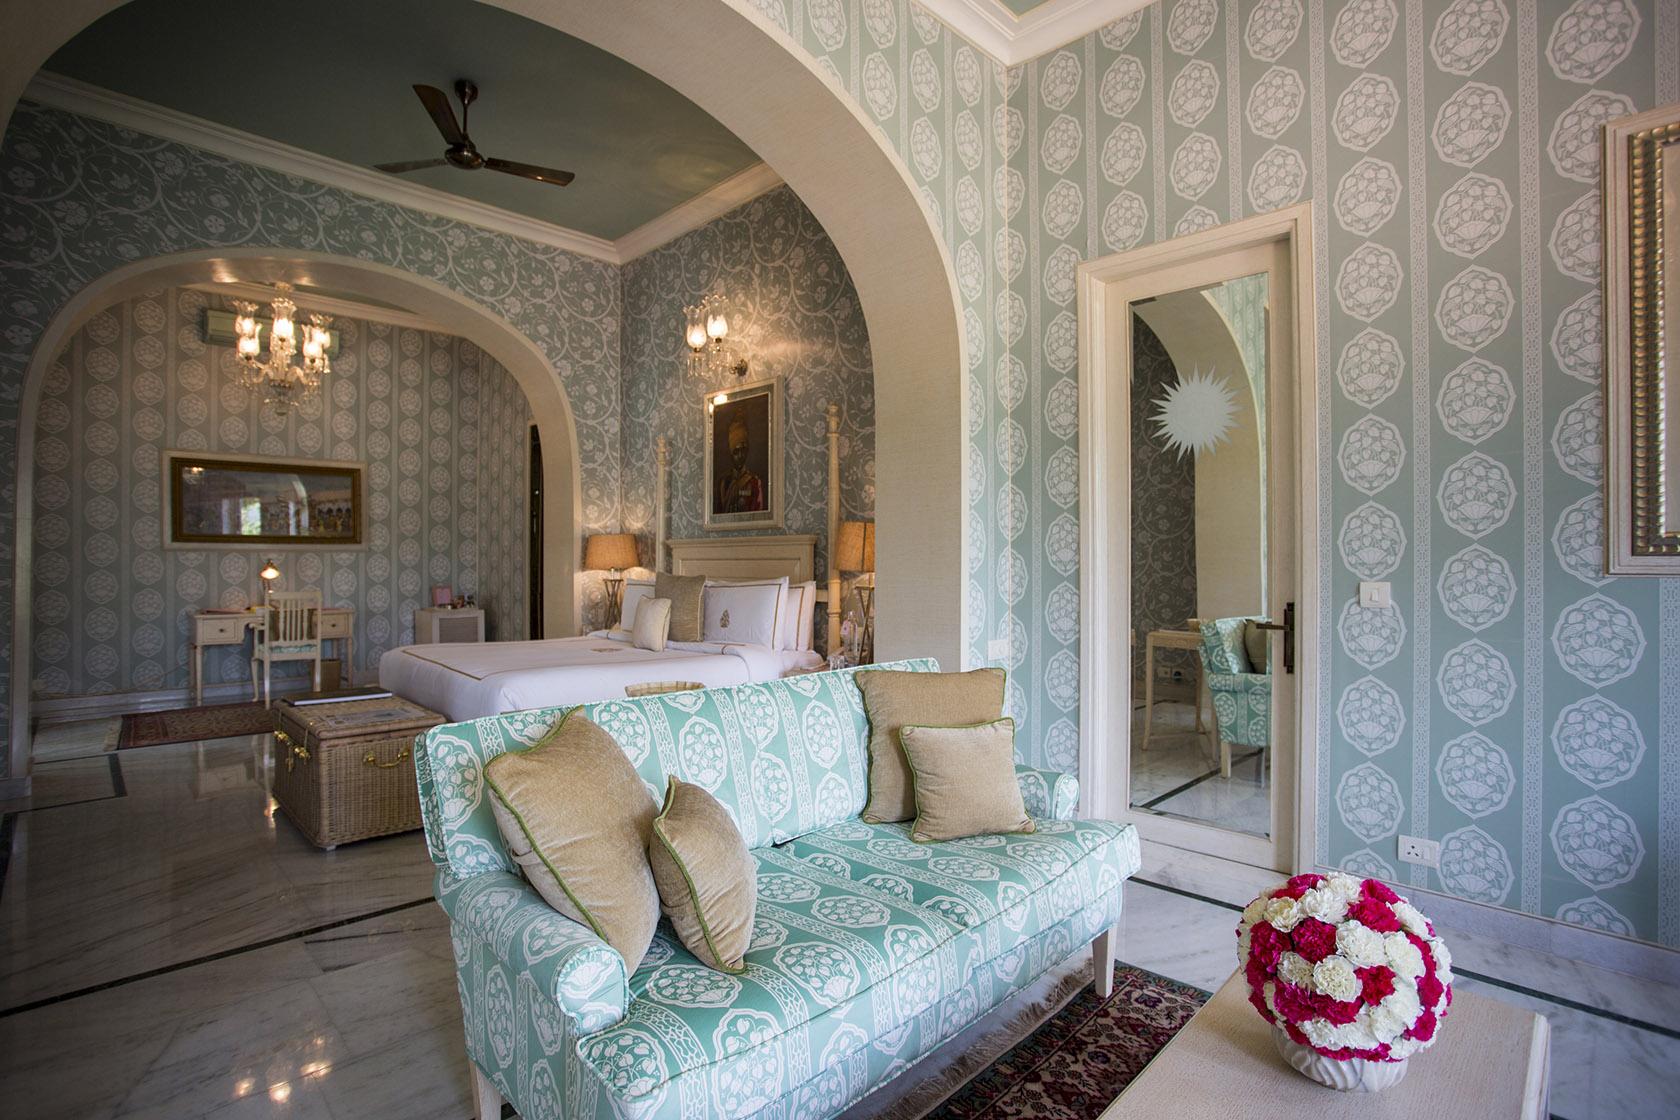 The Queen Elizabeth II Suite Rajmahal Palace